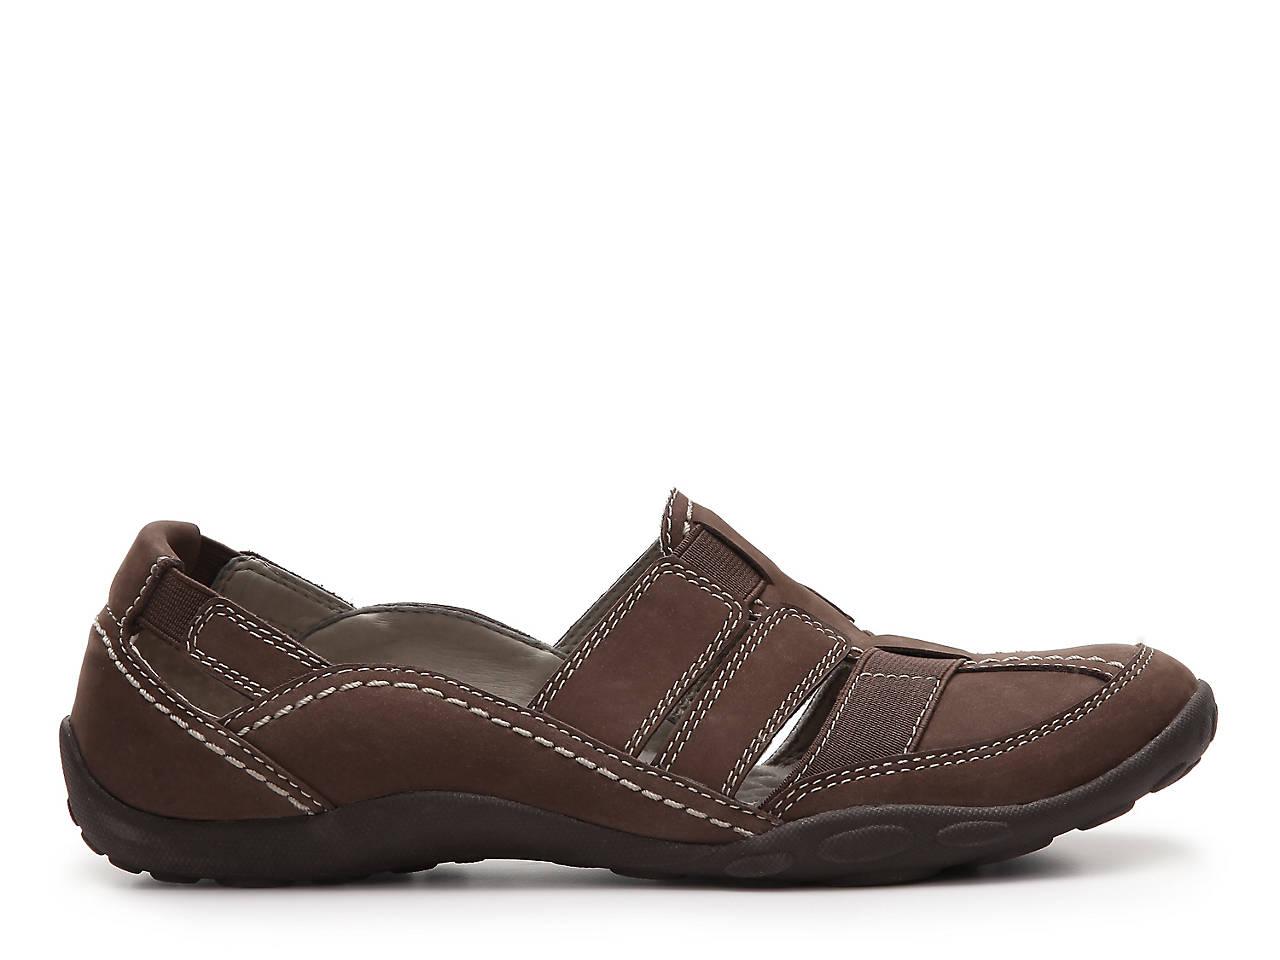 1f594bd34b9 Clarks Haley Stork Sport Flat Women s Shoes